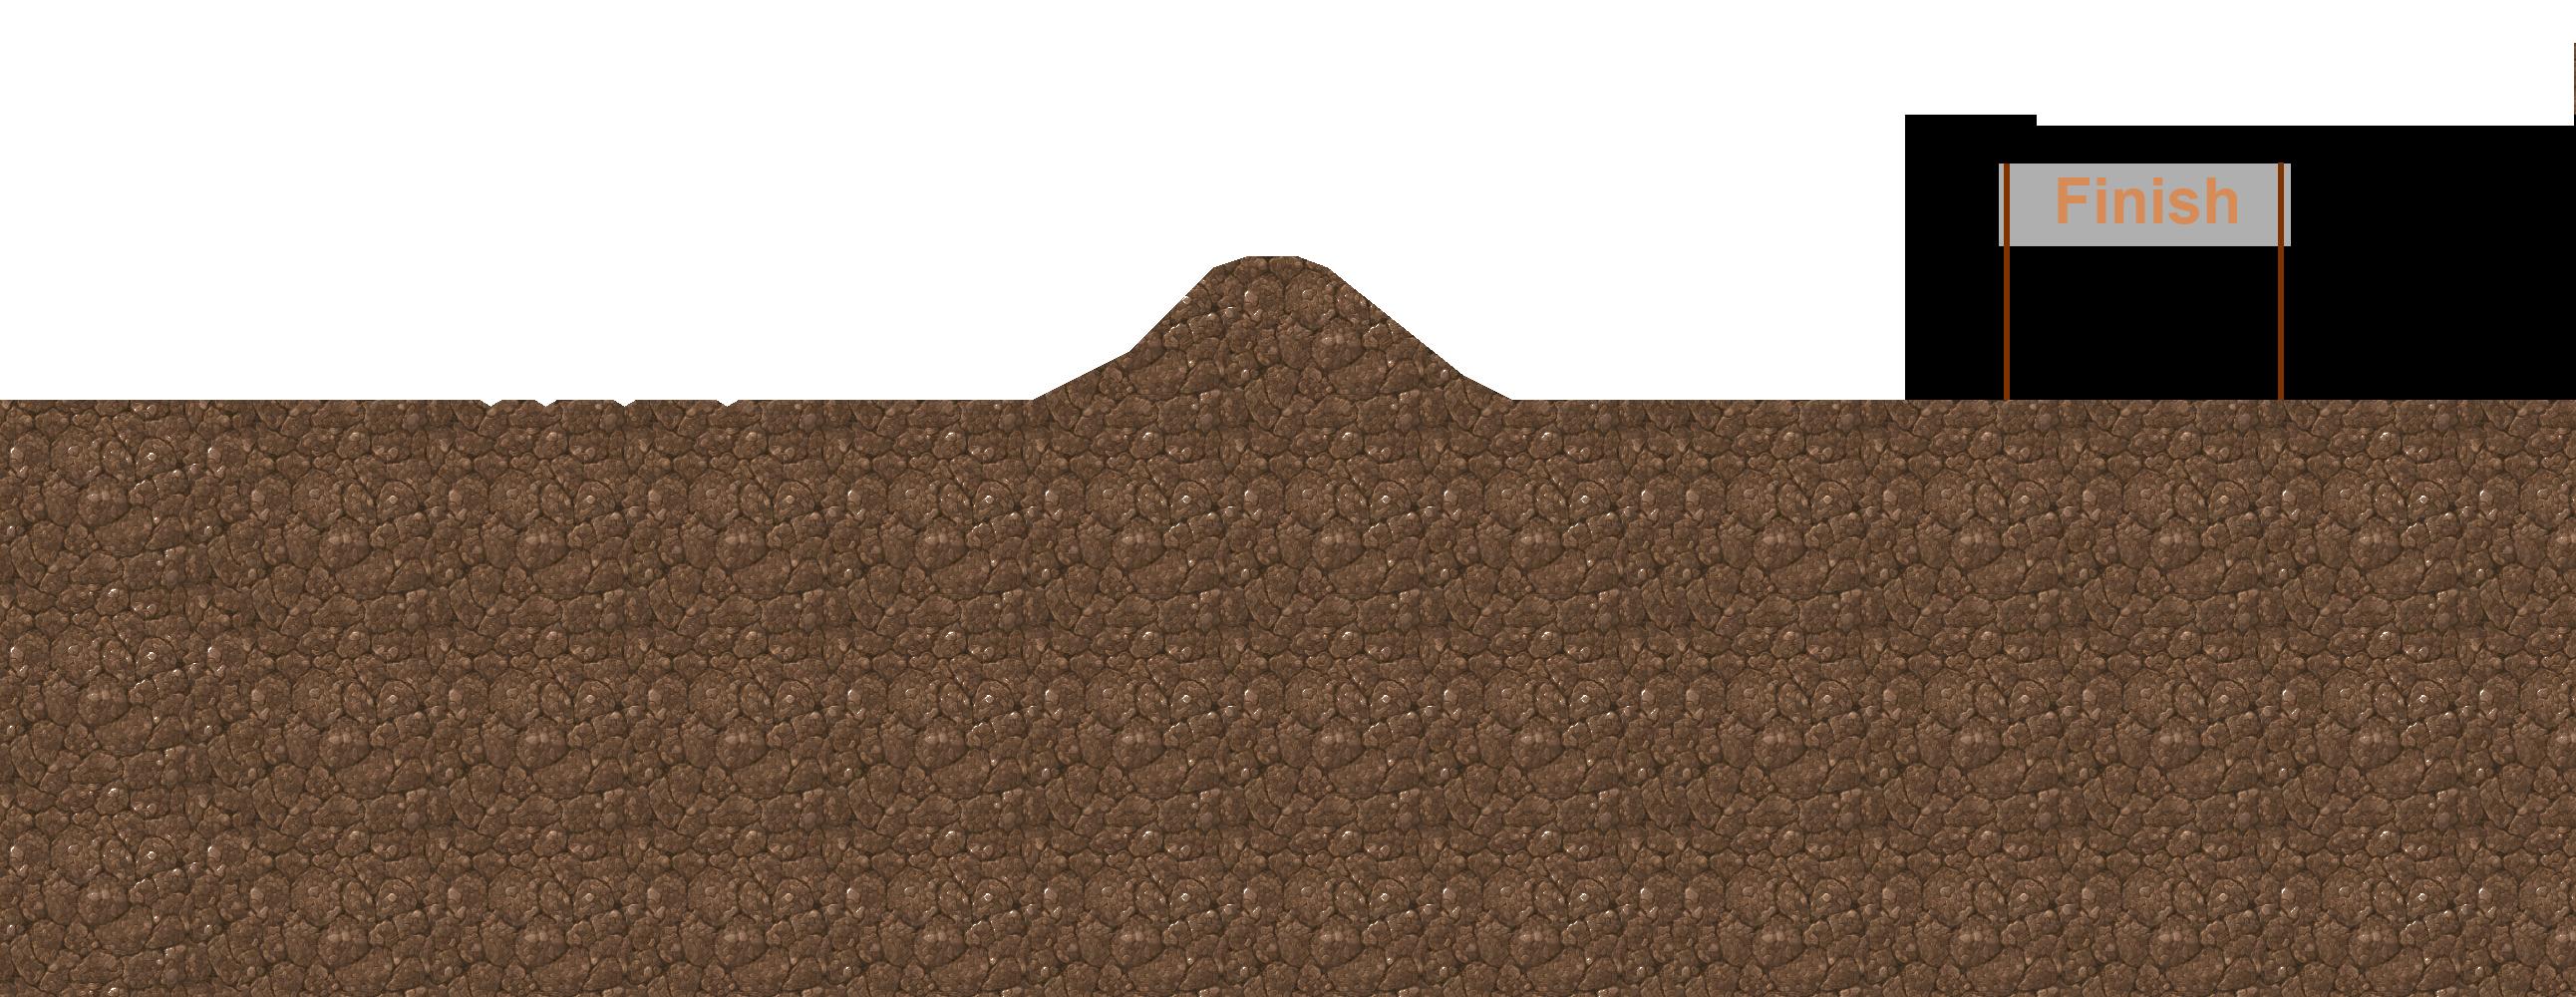 Dirt clipart dirt texture. Libgdx java png modificaiton